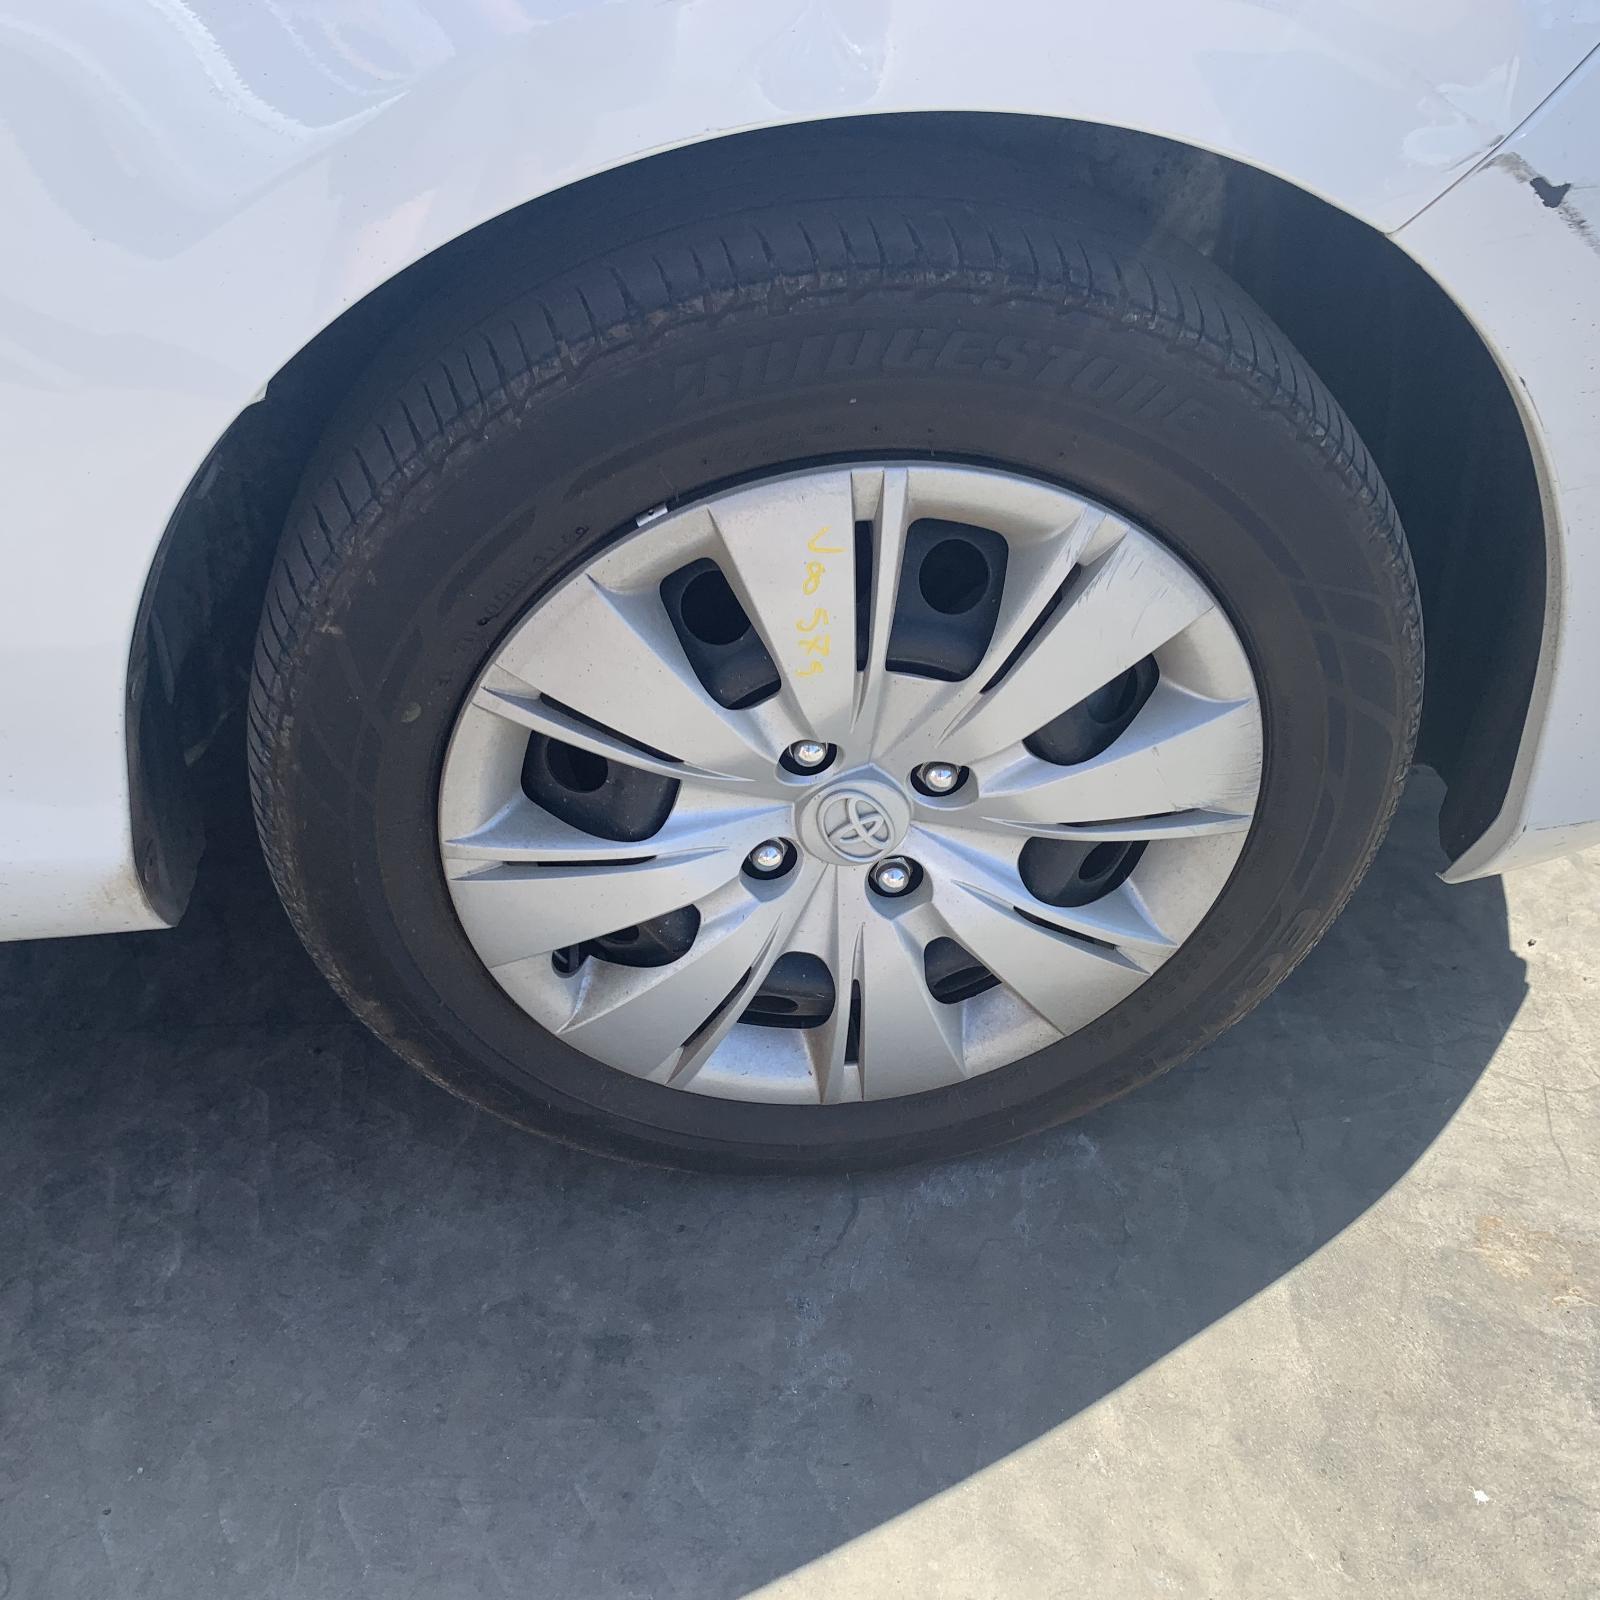 TOYOTA YARIS, Wheel Cover/Hub Cap, XP130 SERIES, 10/11-